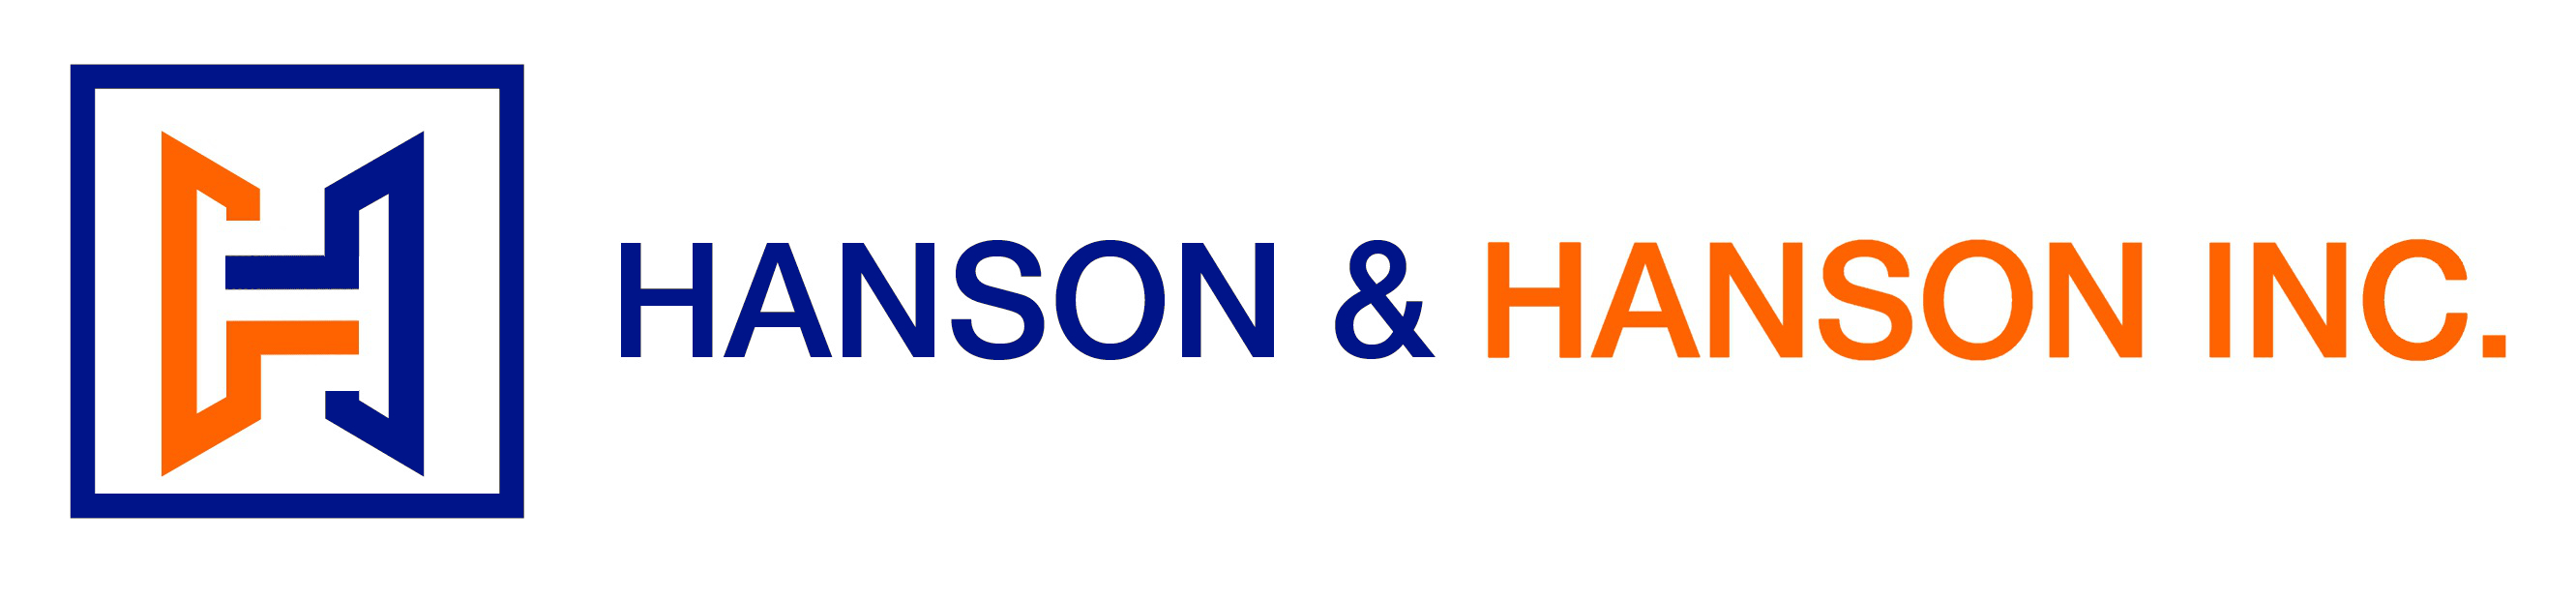 Hanson & Hanson Inc.